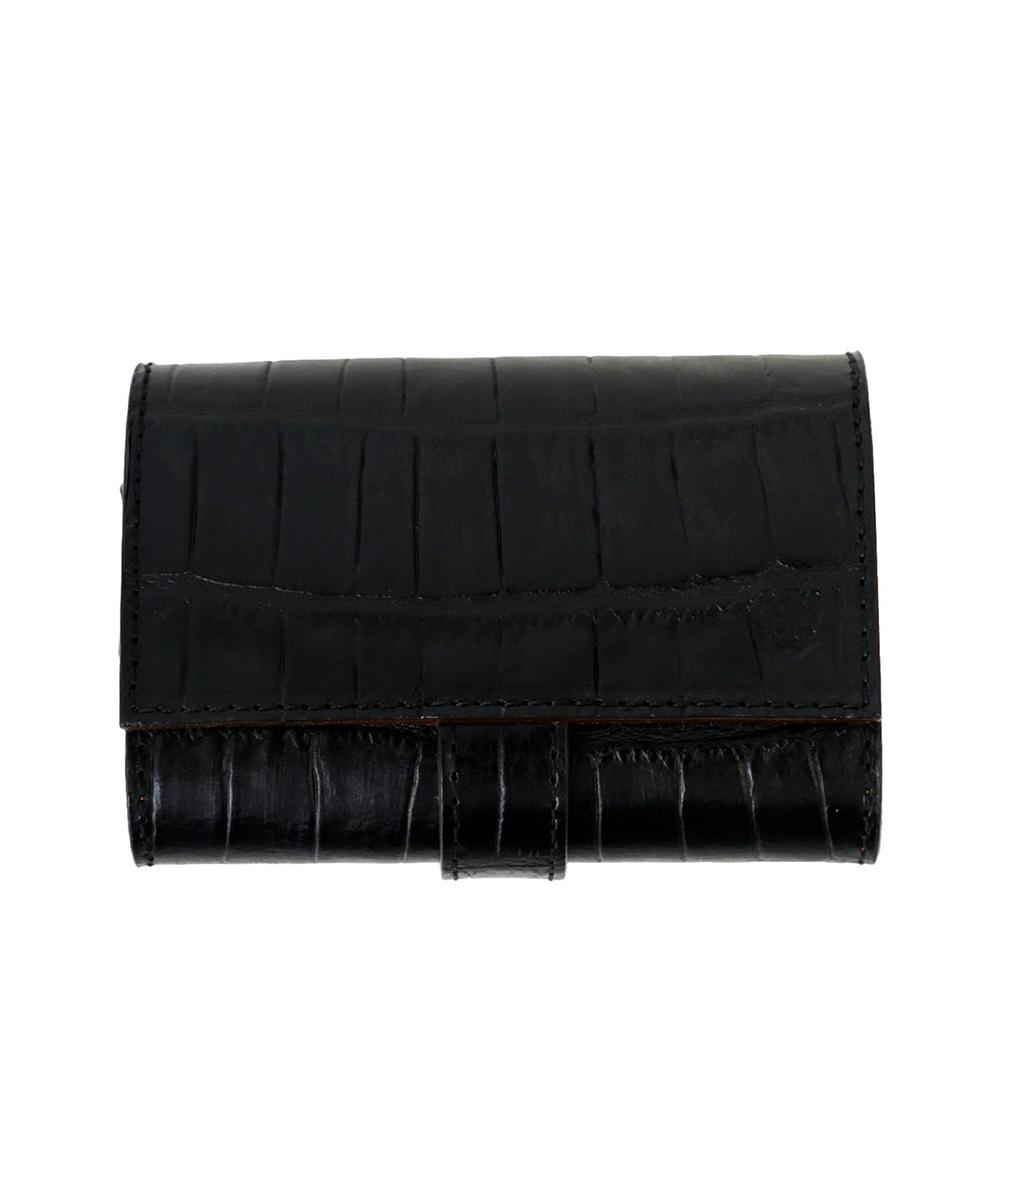 Felisi / フェリージ : Wallet : ウォレット レザー 財布 : 1041-SA-003-bjb 【BJB】